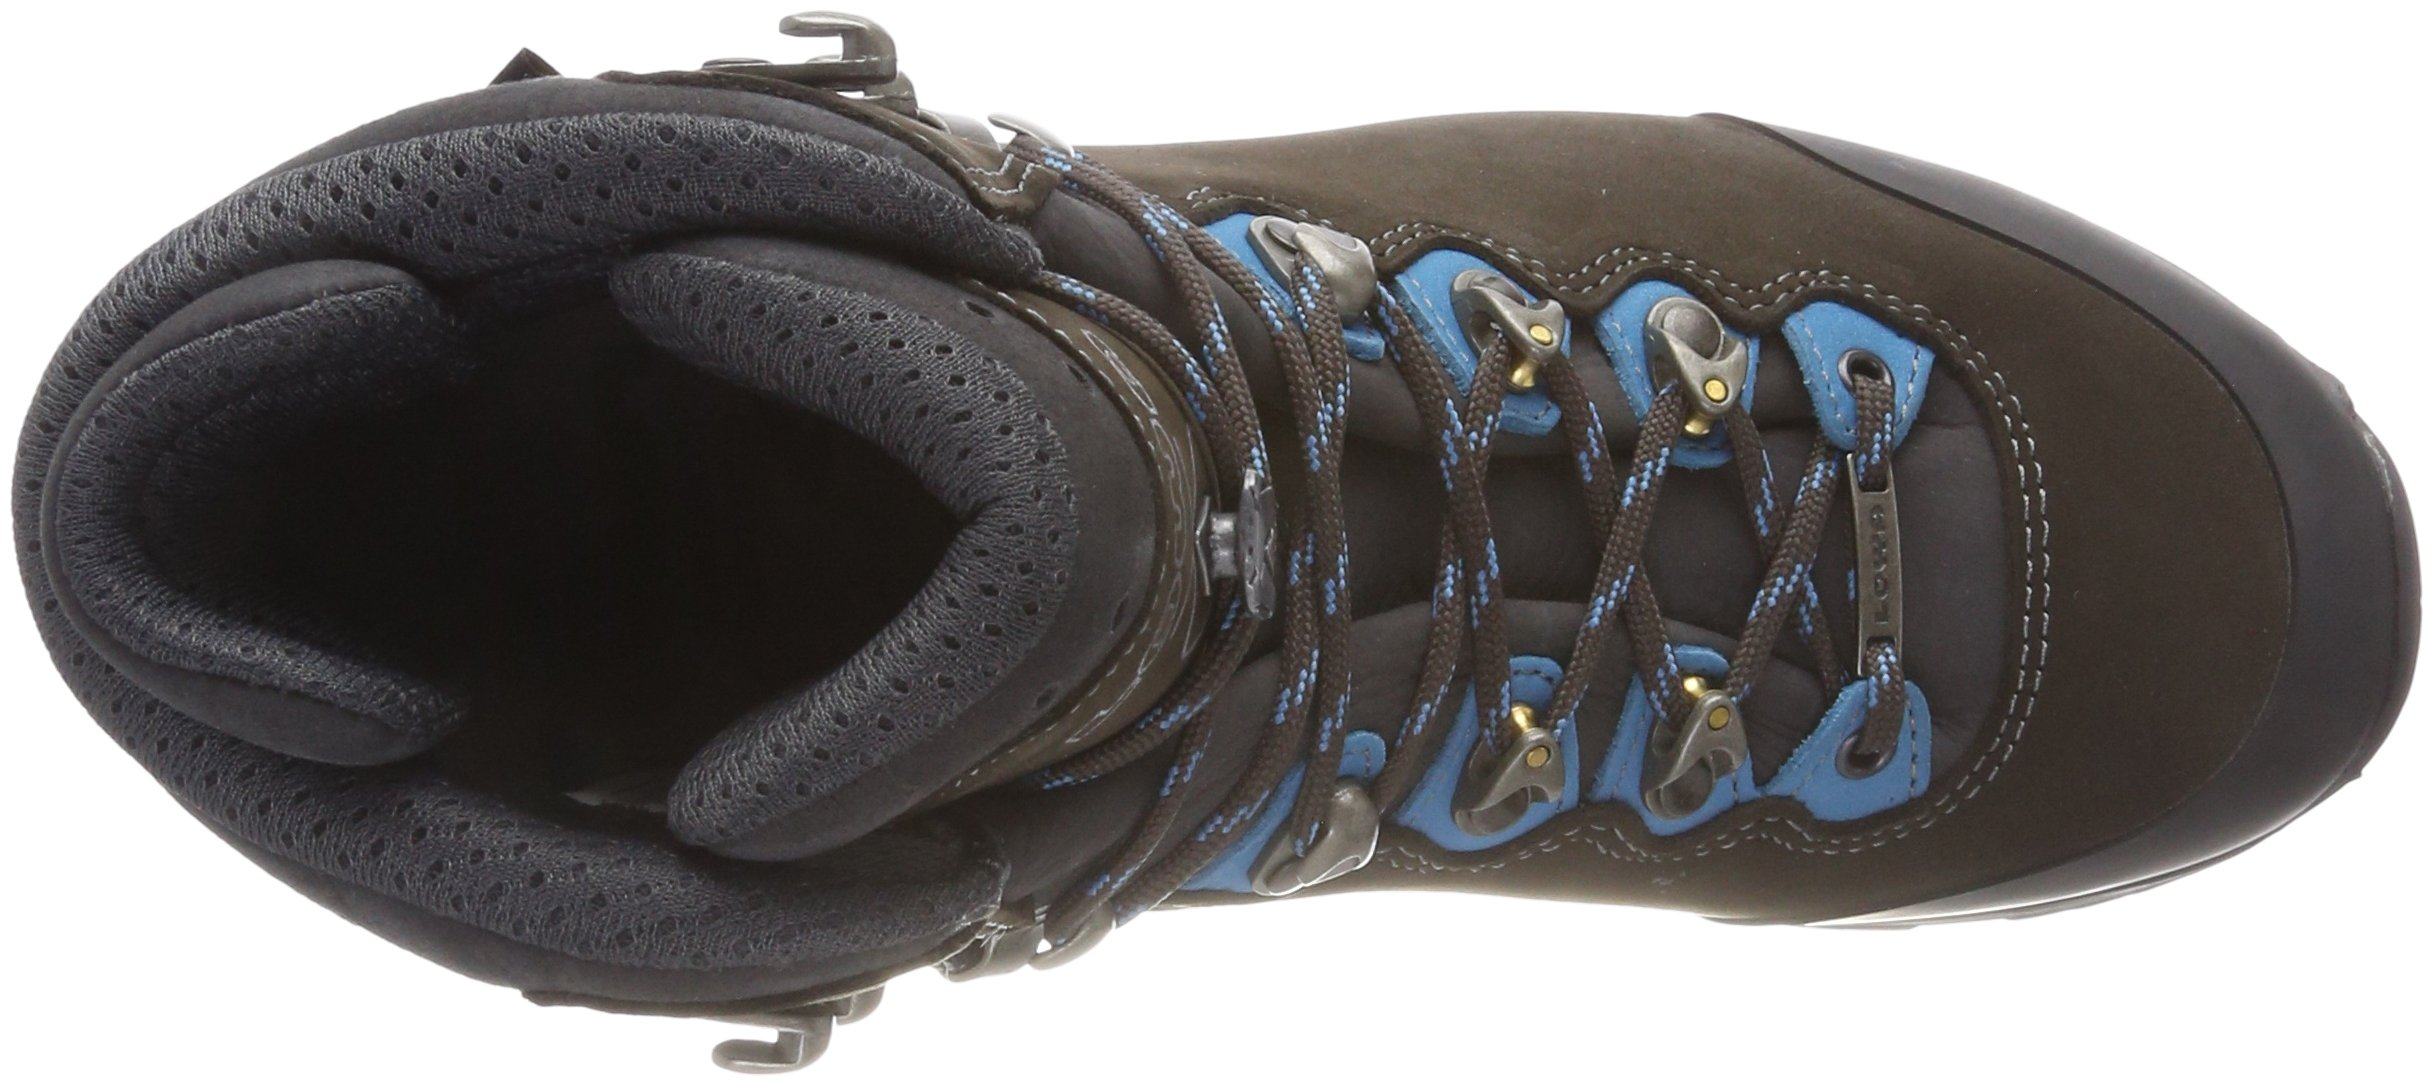 81CRAvDVFkL - Lowa Women's Mauria GTX Ws High Rise Hiking Boots